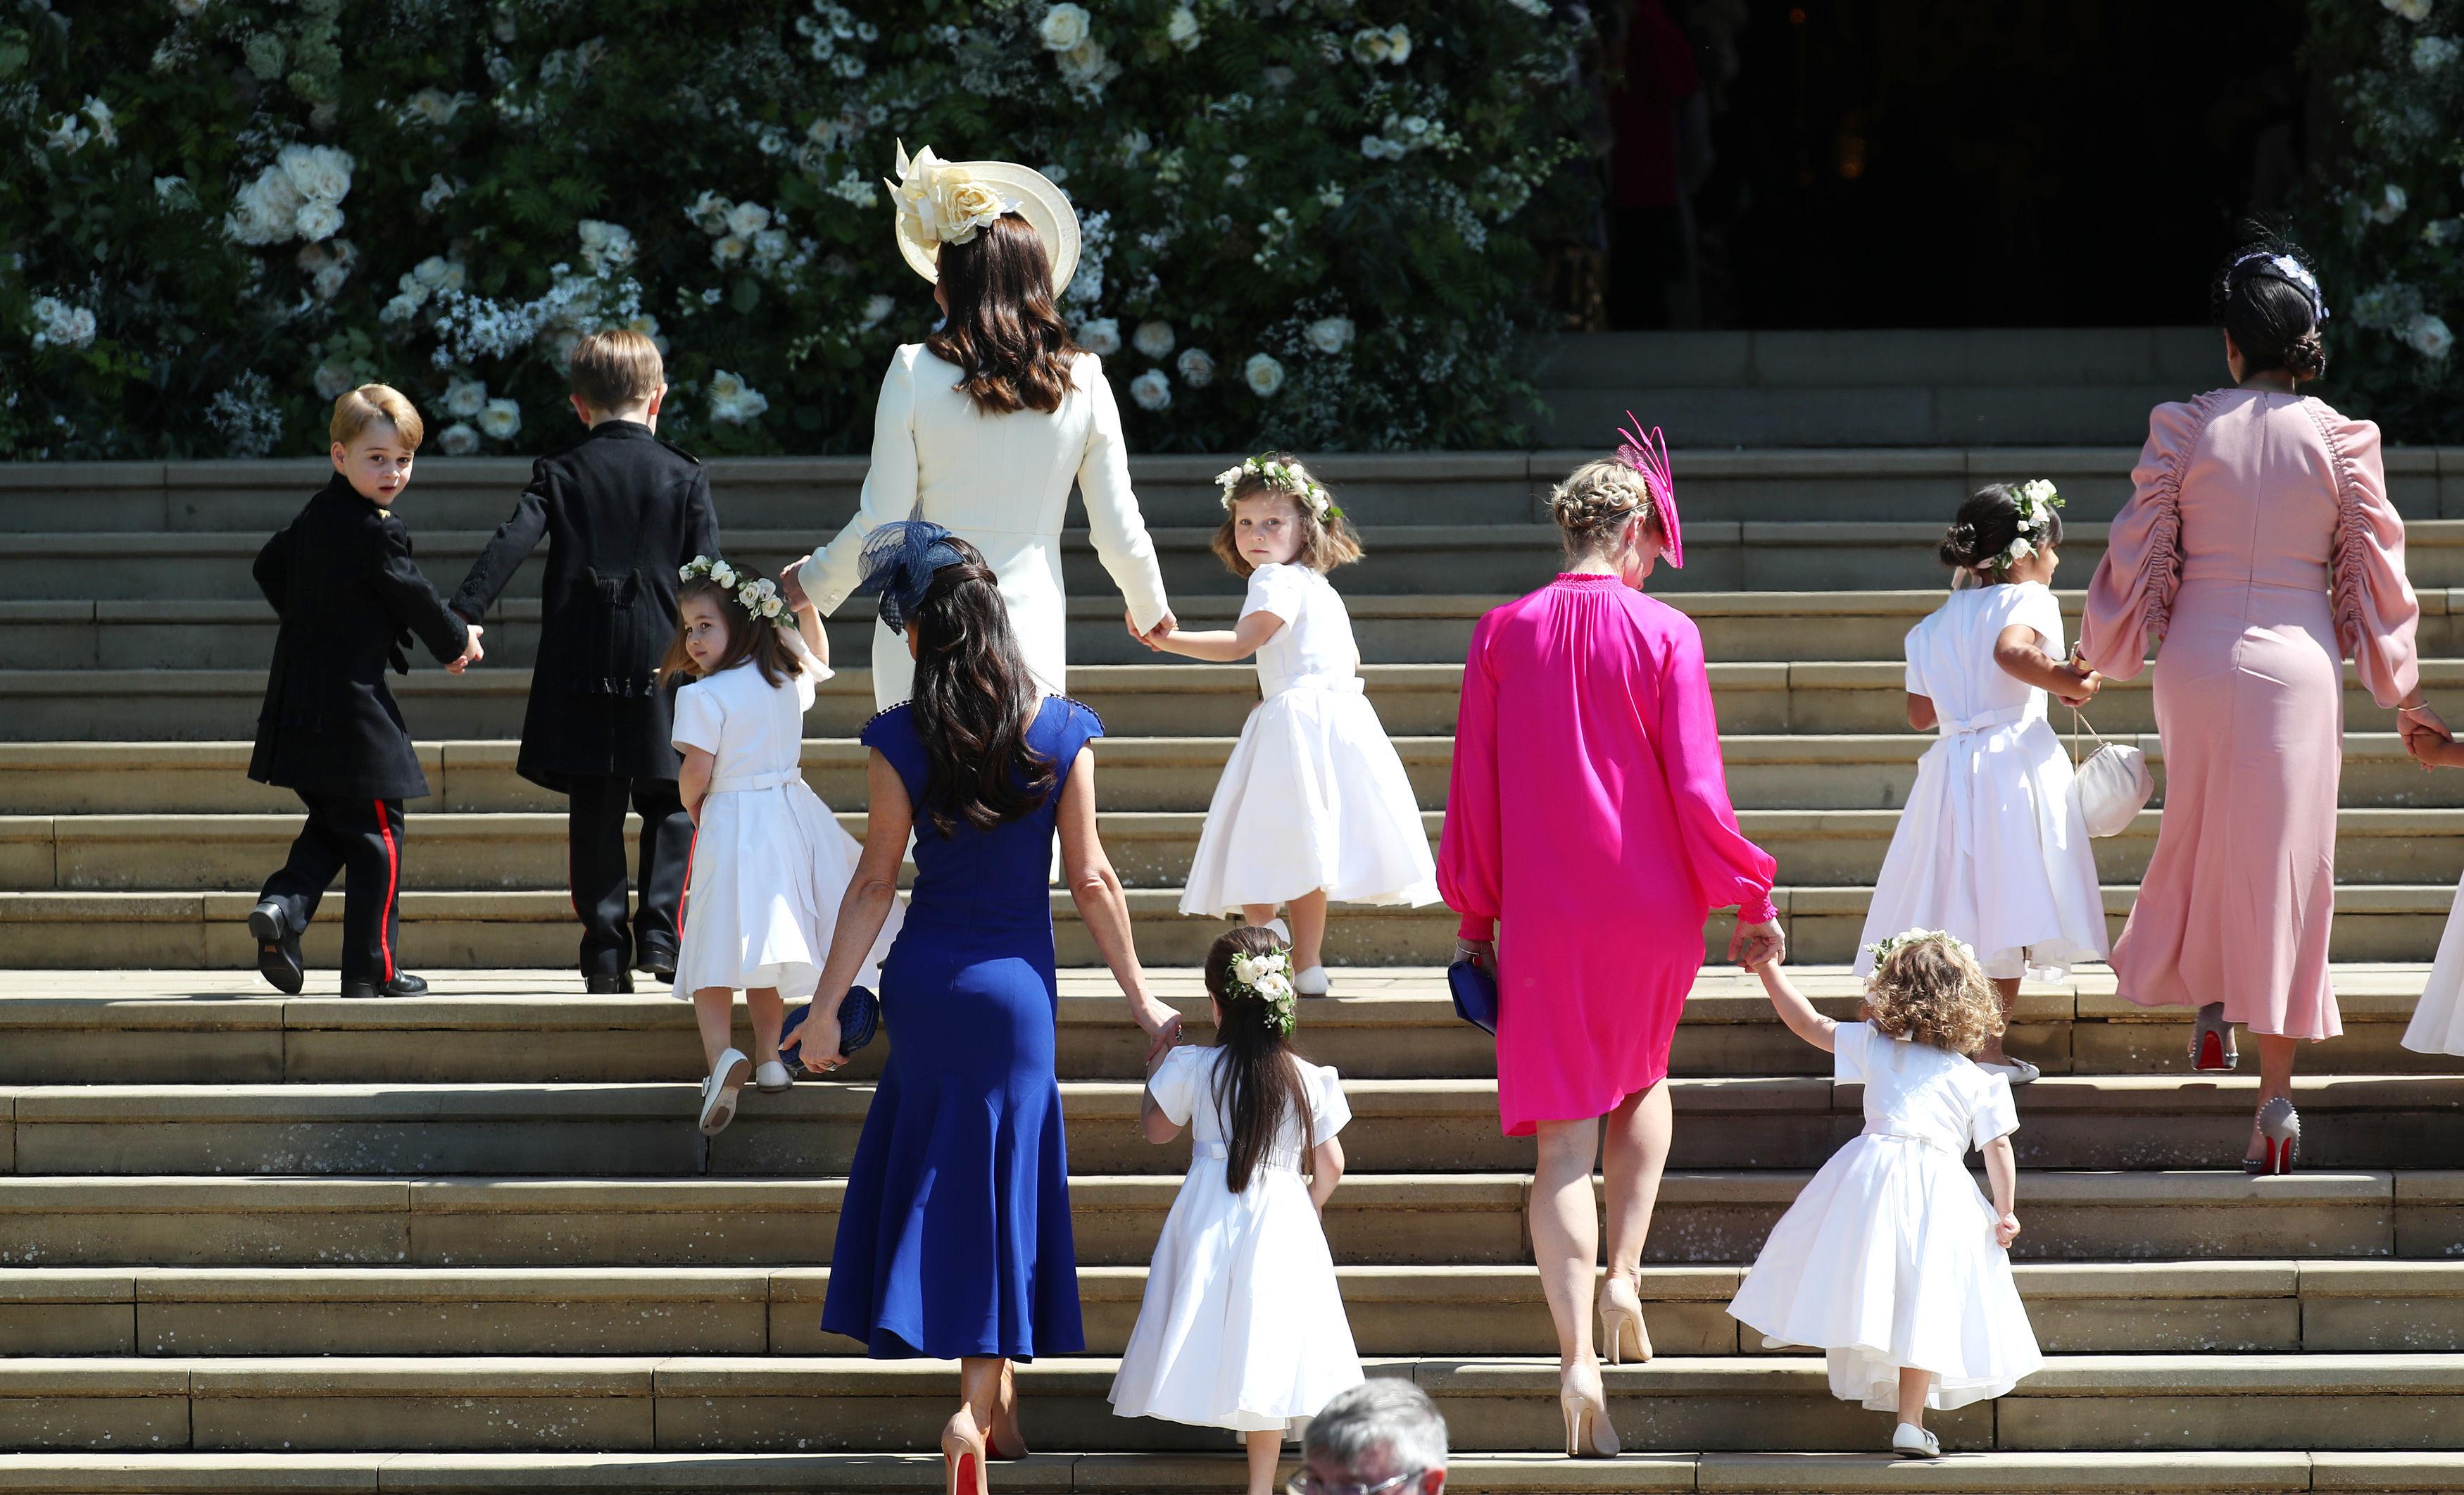 prince-harry-marries-ms-meghan-markle-windsor-castle-17